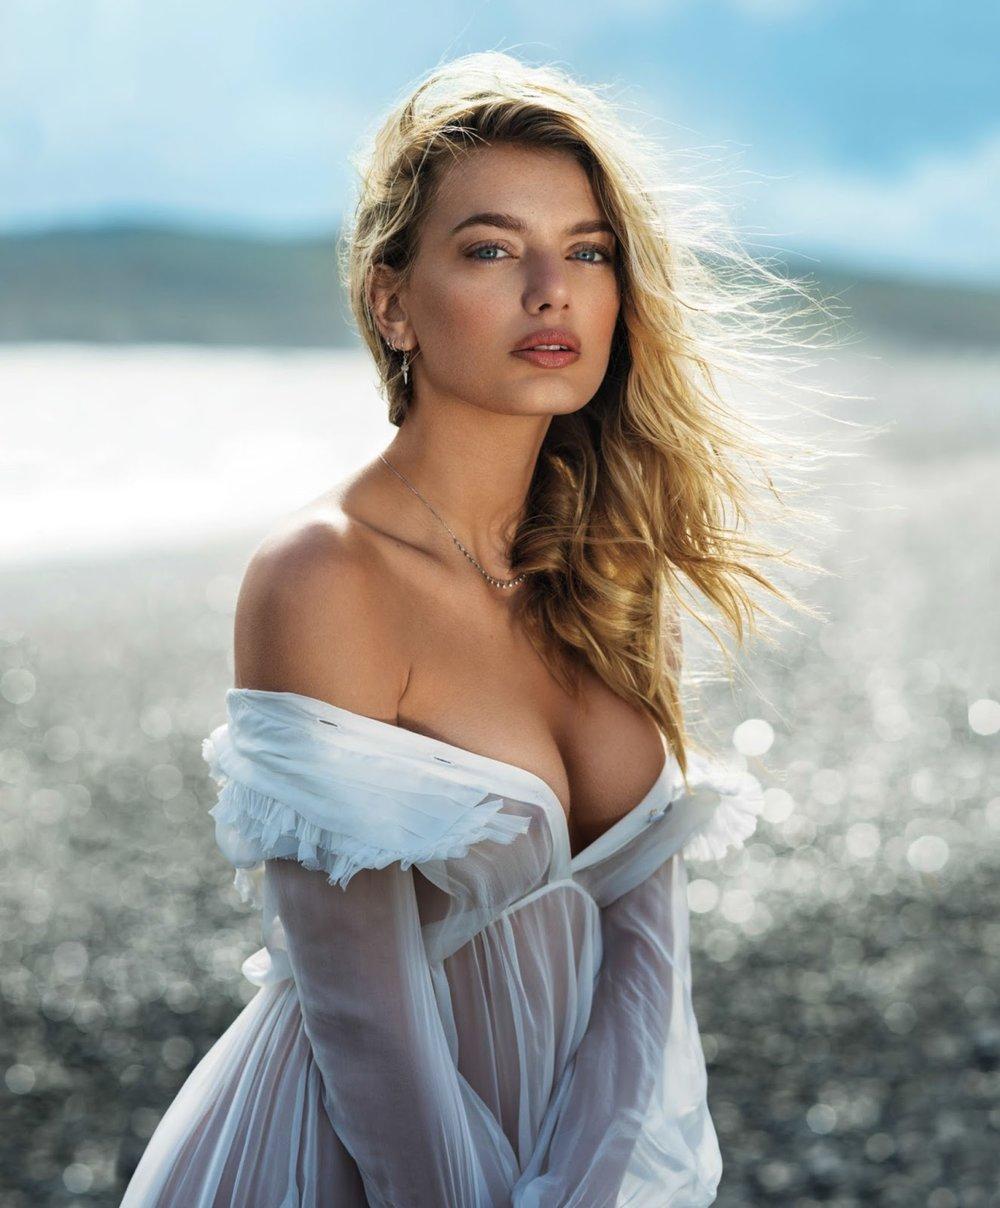 Maxim USA September 2017-1.jpg